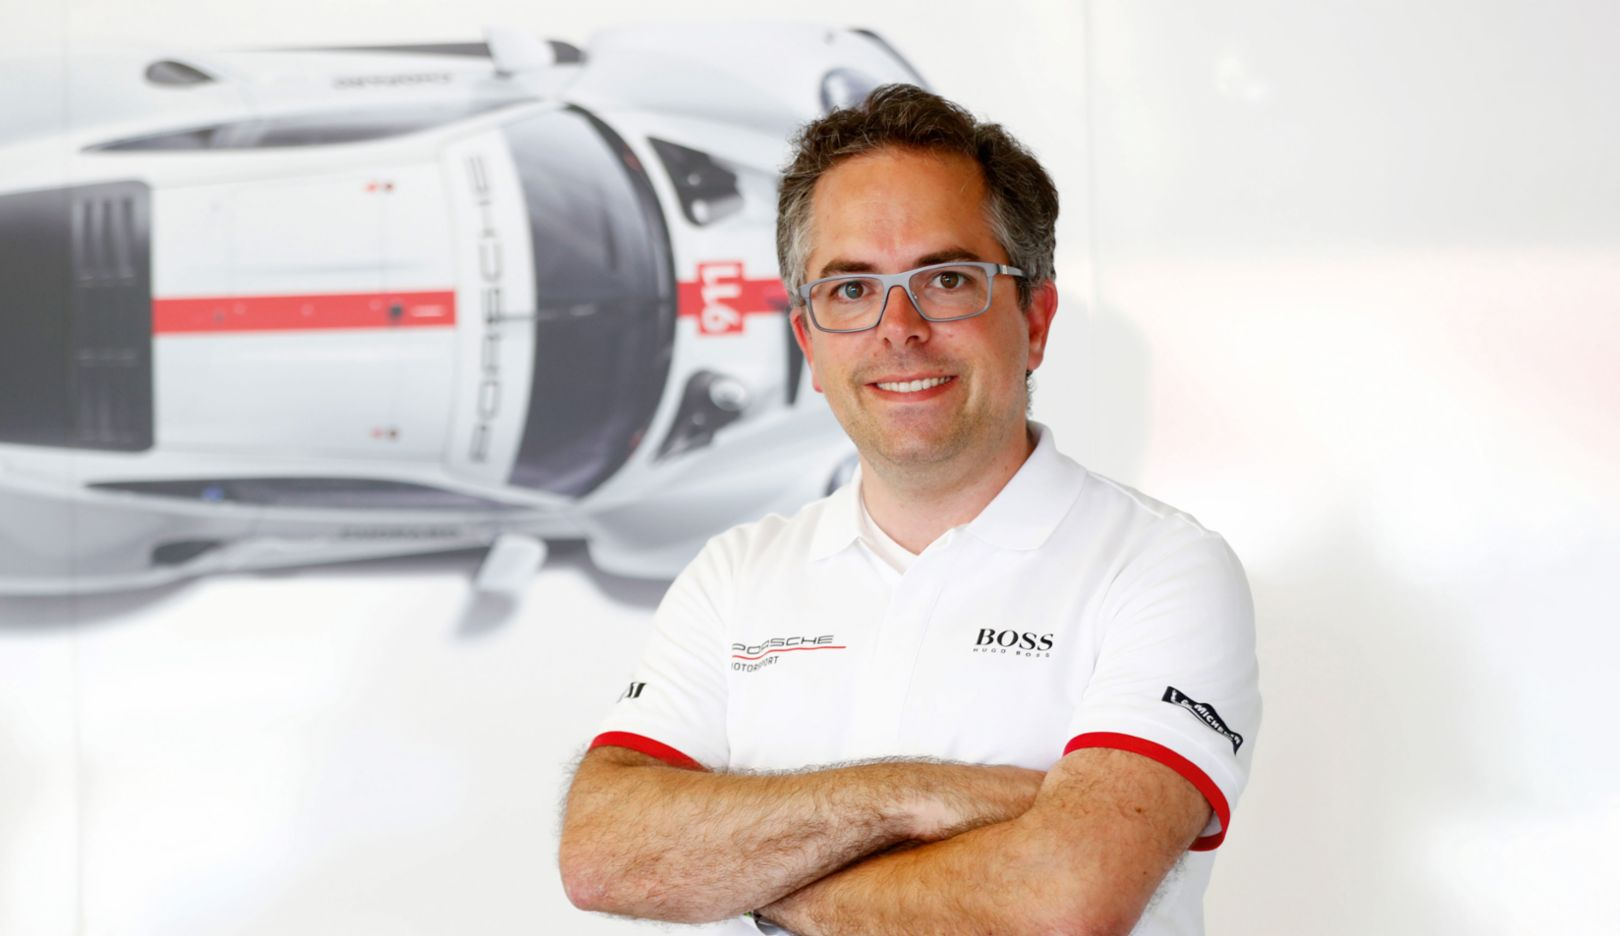 Pascal Zurlinden discusses the effects of the coronavirus crisis for Porsche Motorsport - Image 1